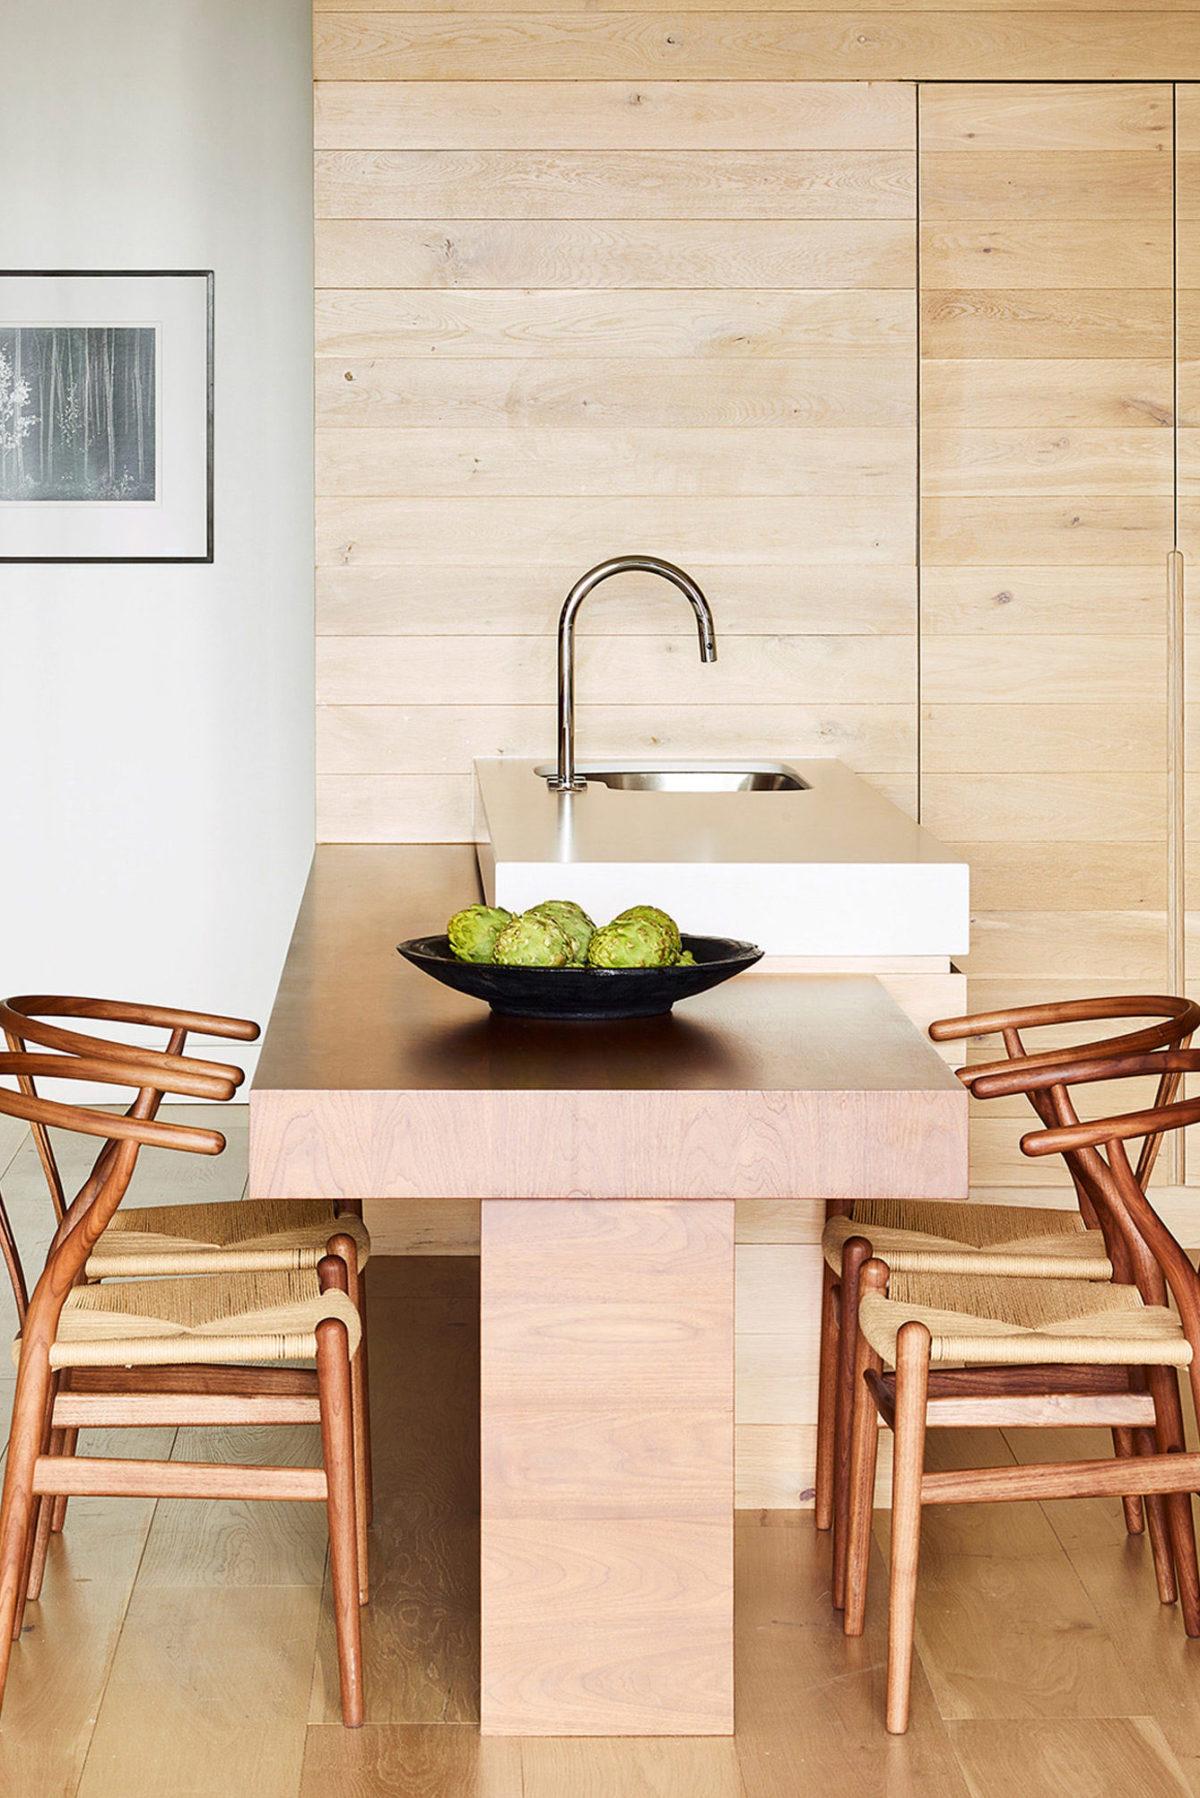 Kari Kari suite - kitchen island